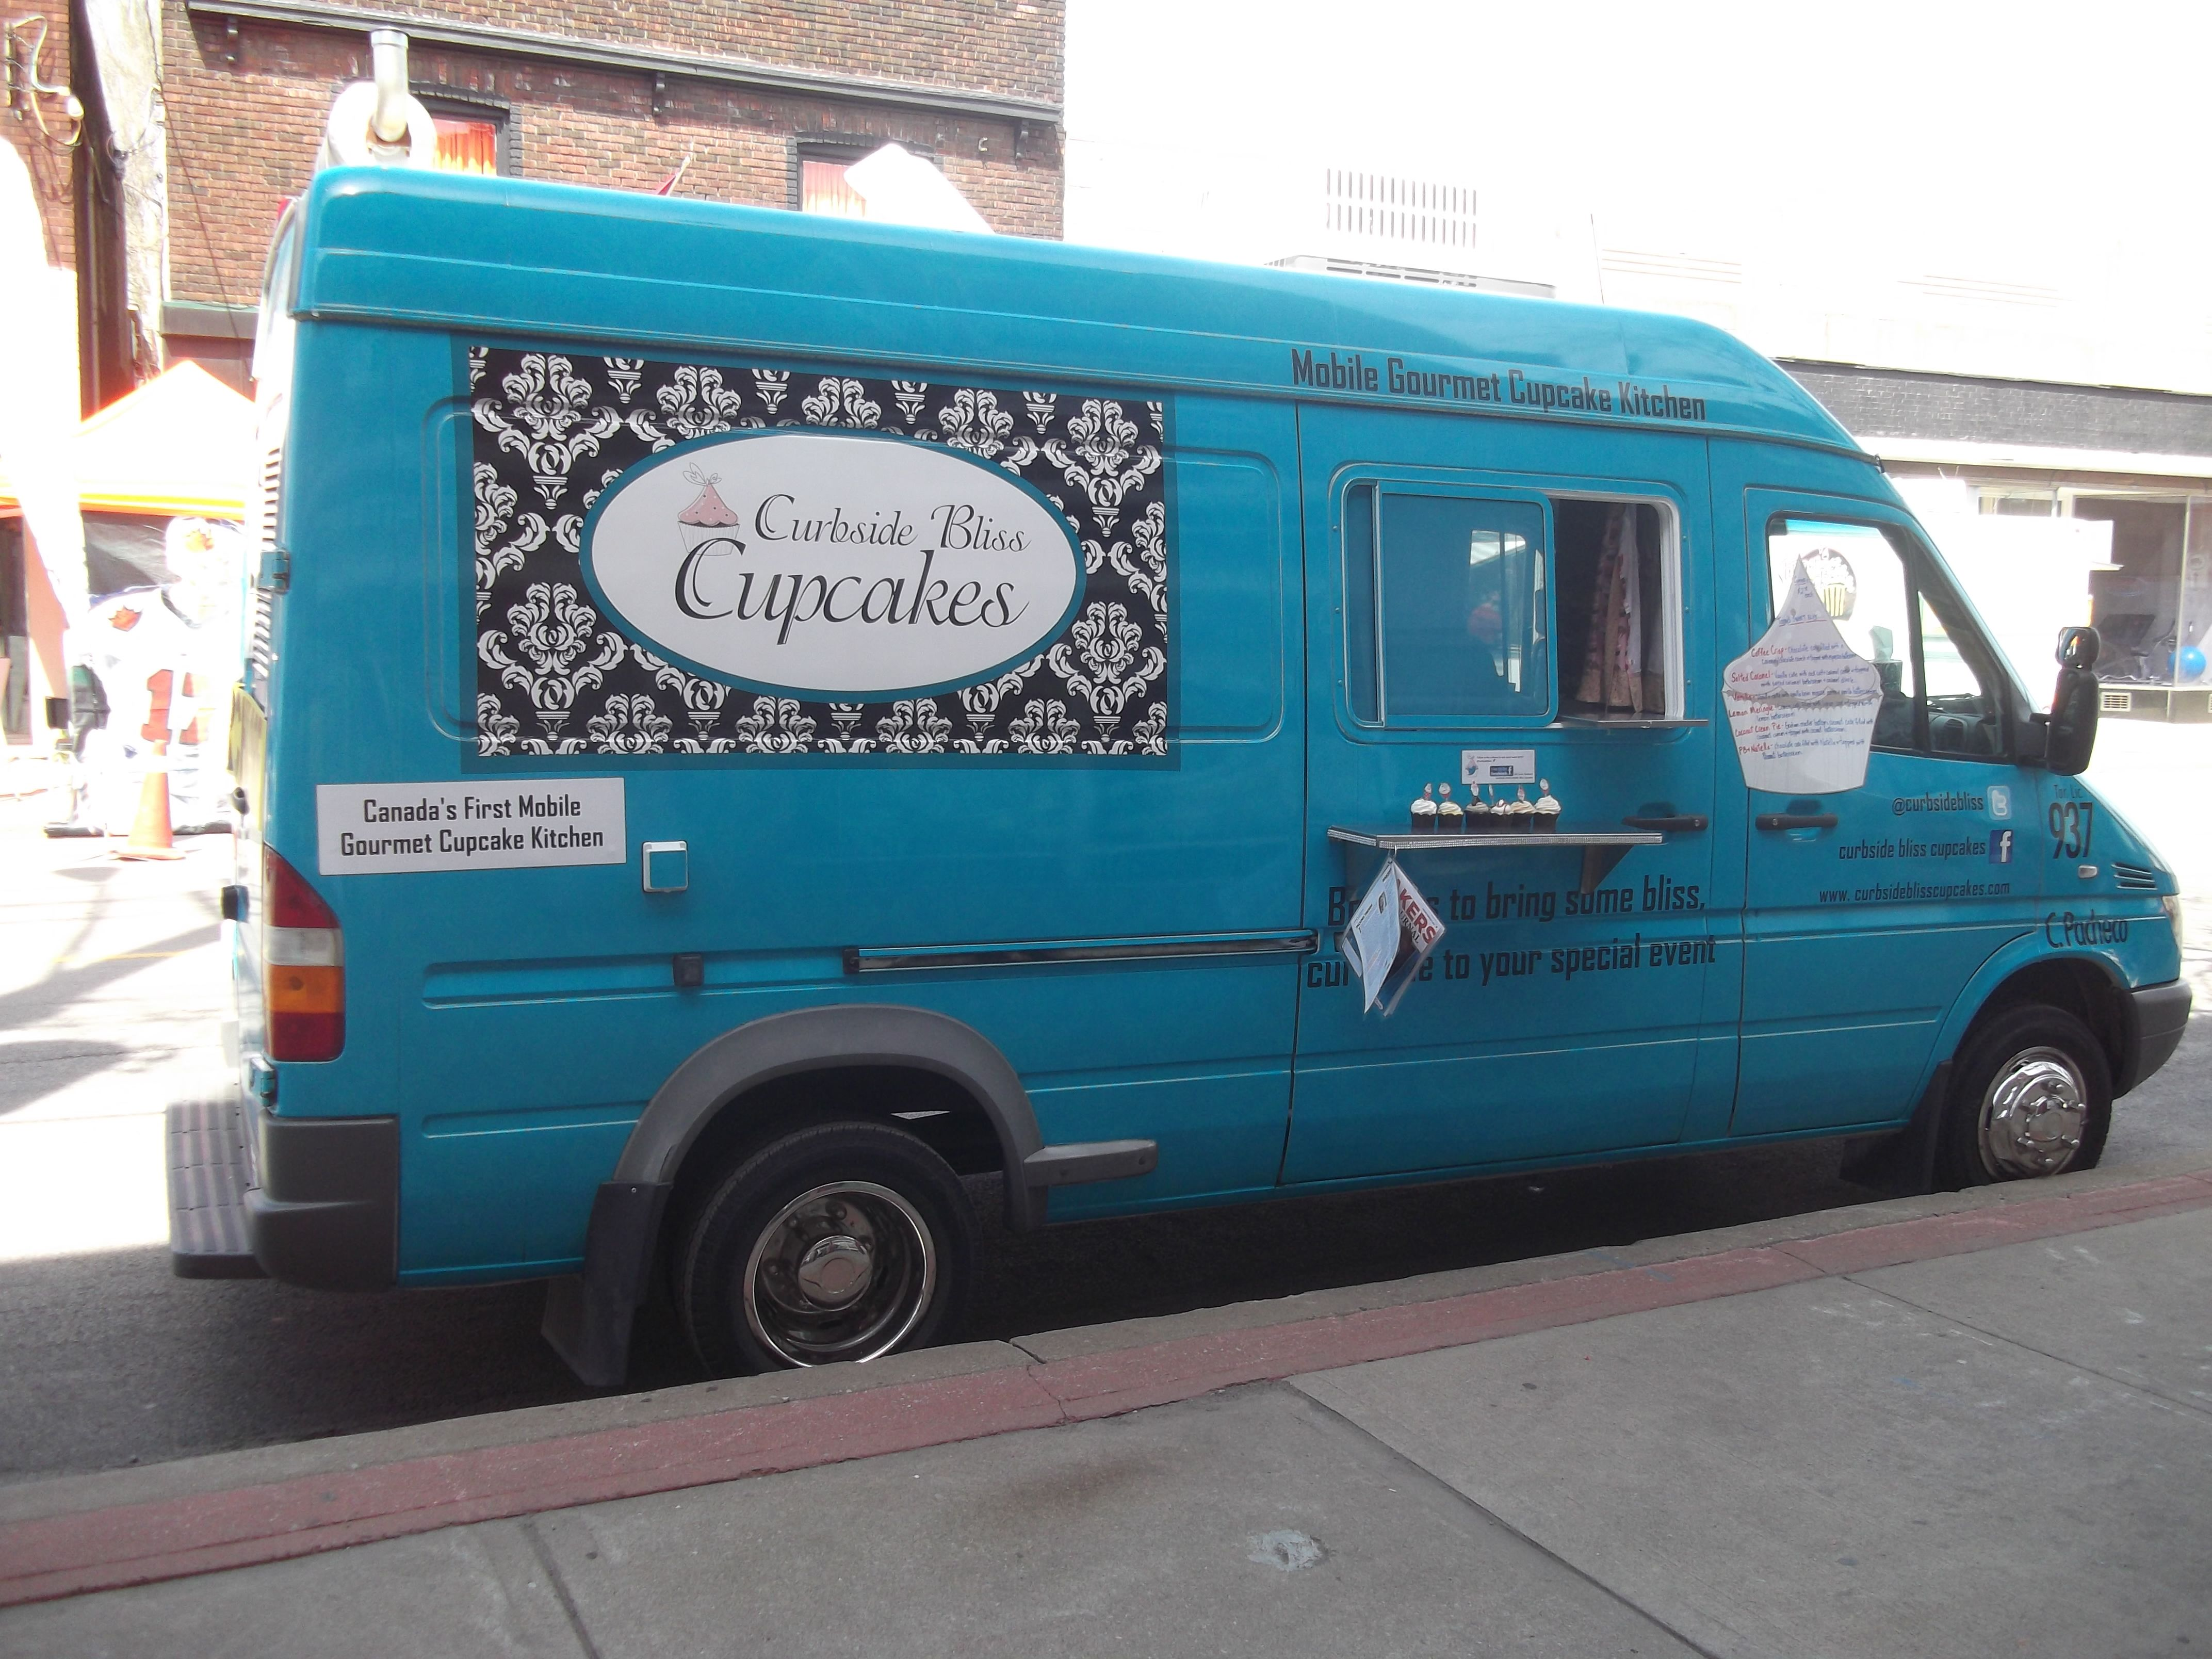 food truck | todds photos | Pinterest | Food truck